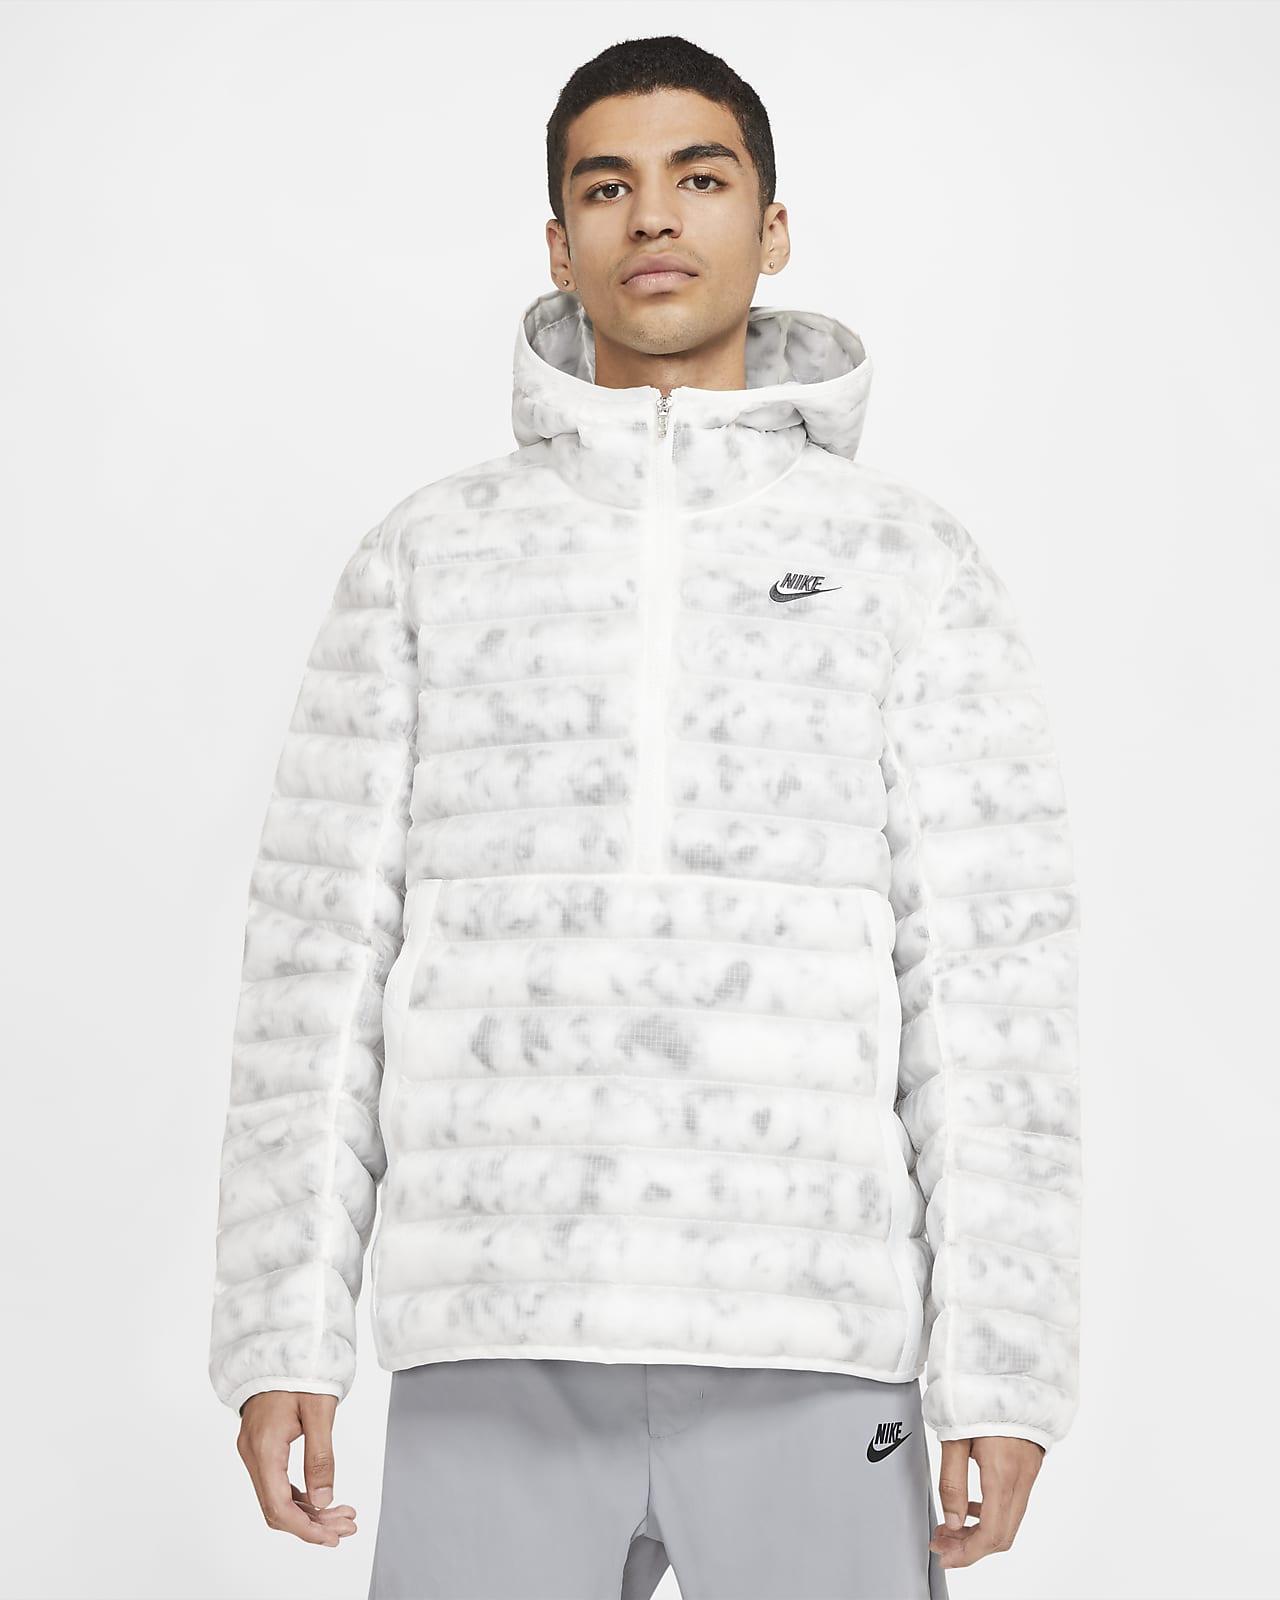 Pánská bunda Nike Sportswear Marble Insulation